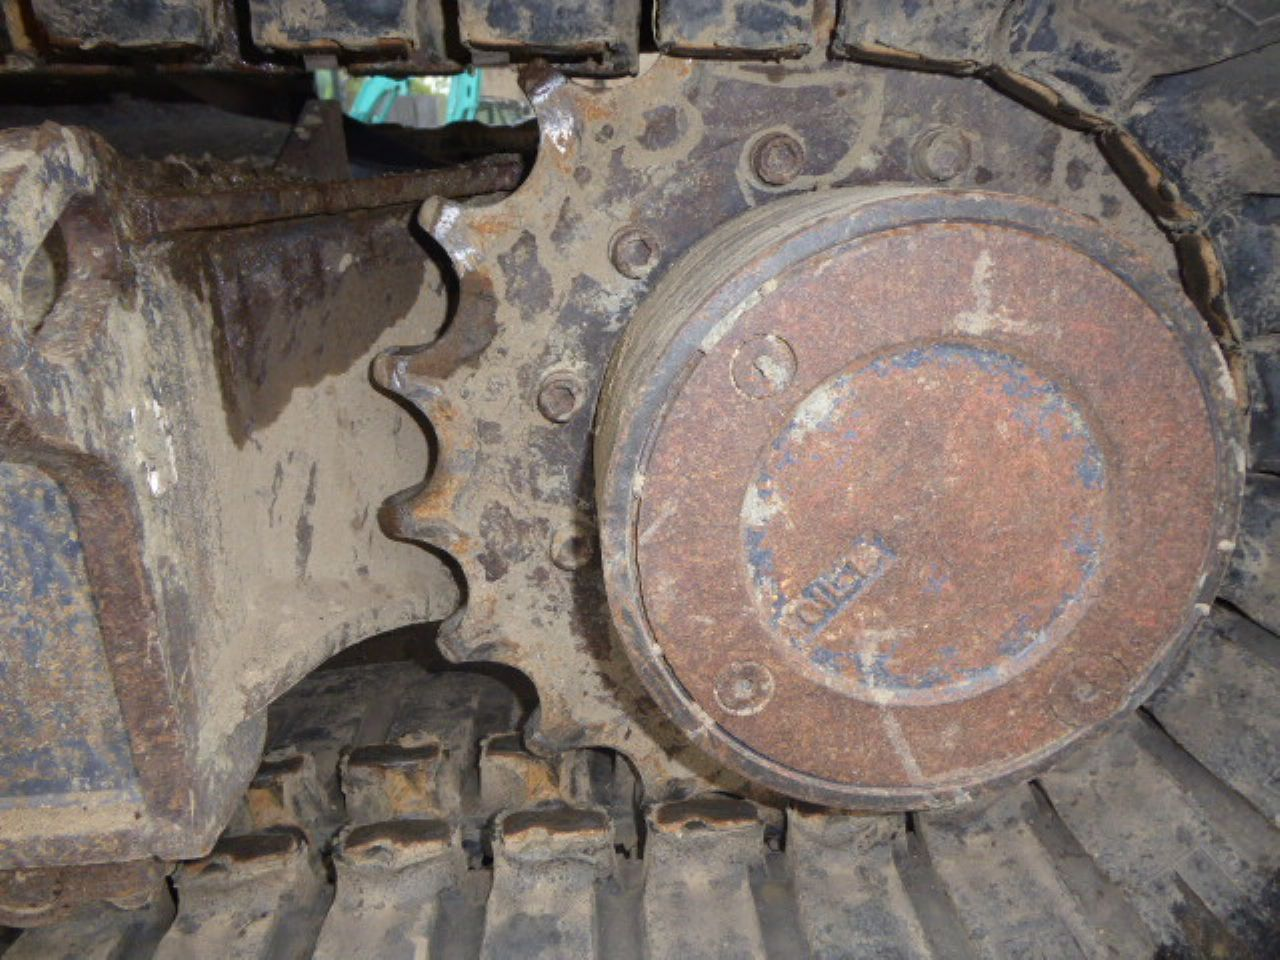 KUBOTA KX080-3A EXCAVATOR - Picture 4